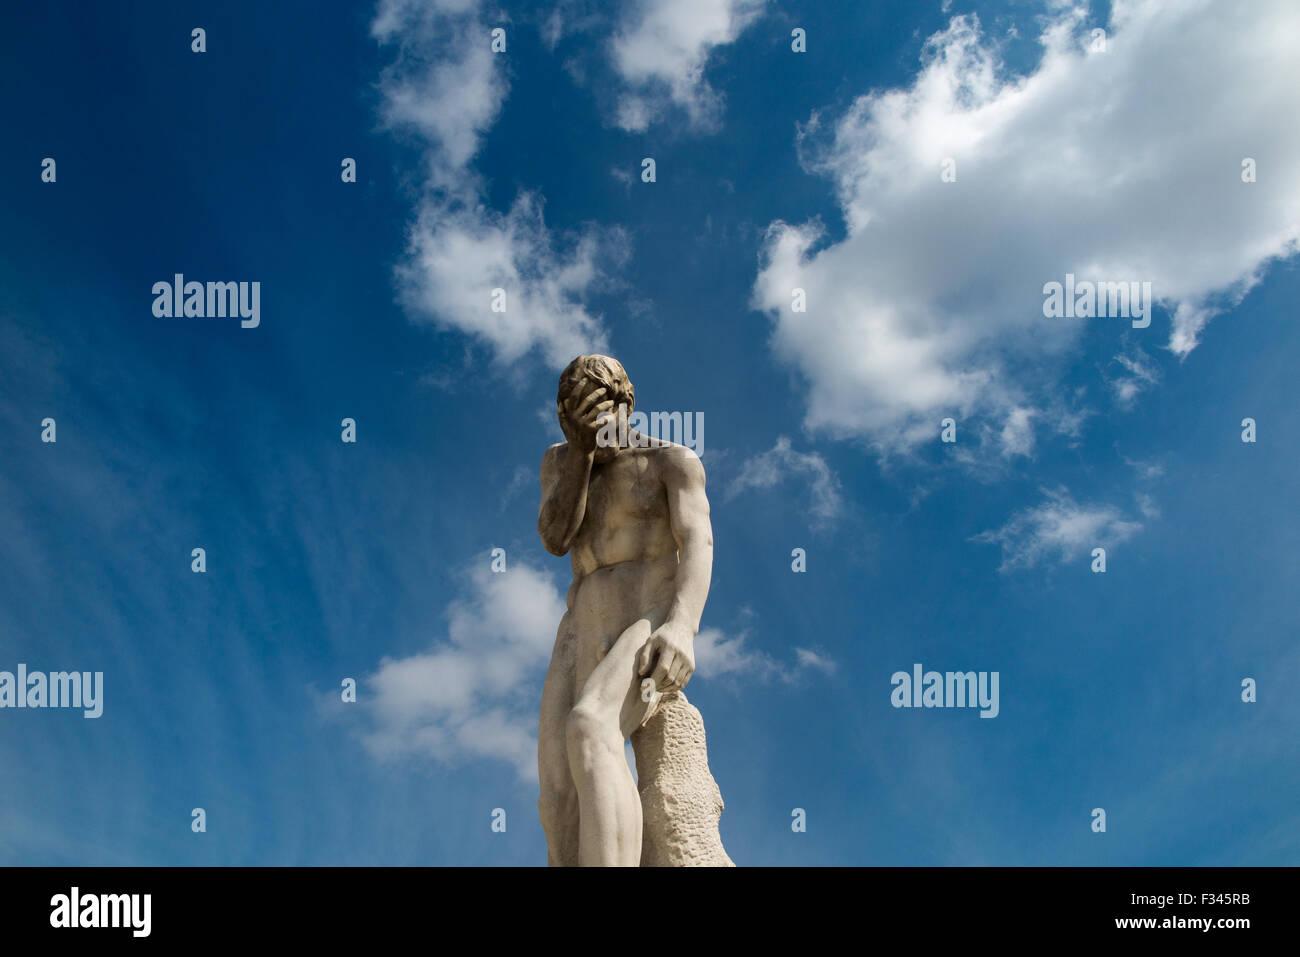 Statua del Jardin des Tuileries, Parigi, Francia Immagini Stock